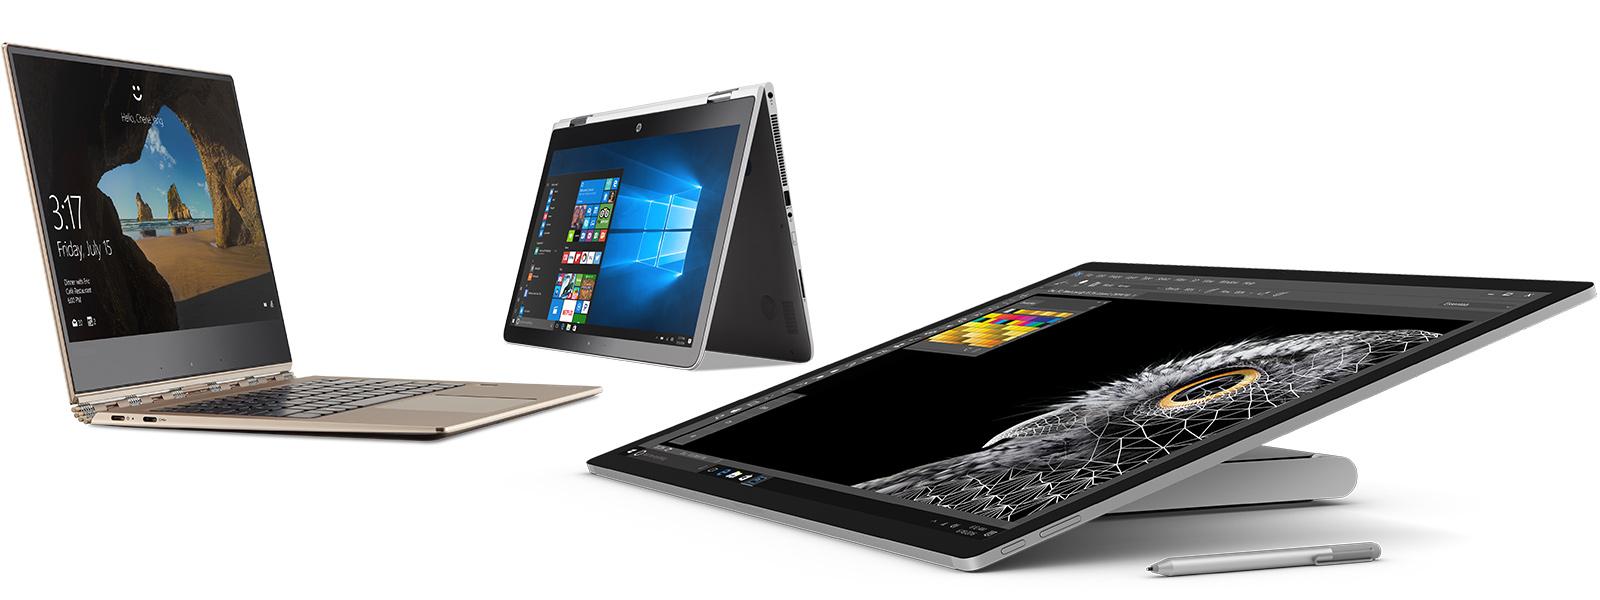 Group image HP Spectre, Lenovo Yoga, and Surface Studio.